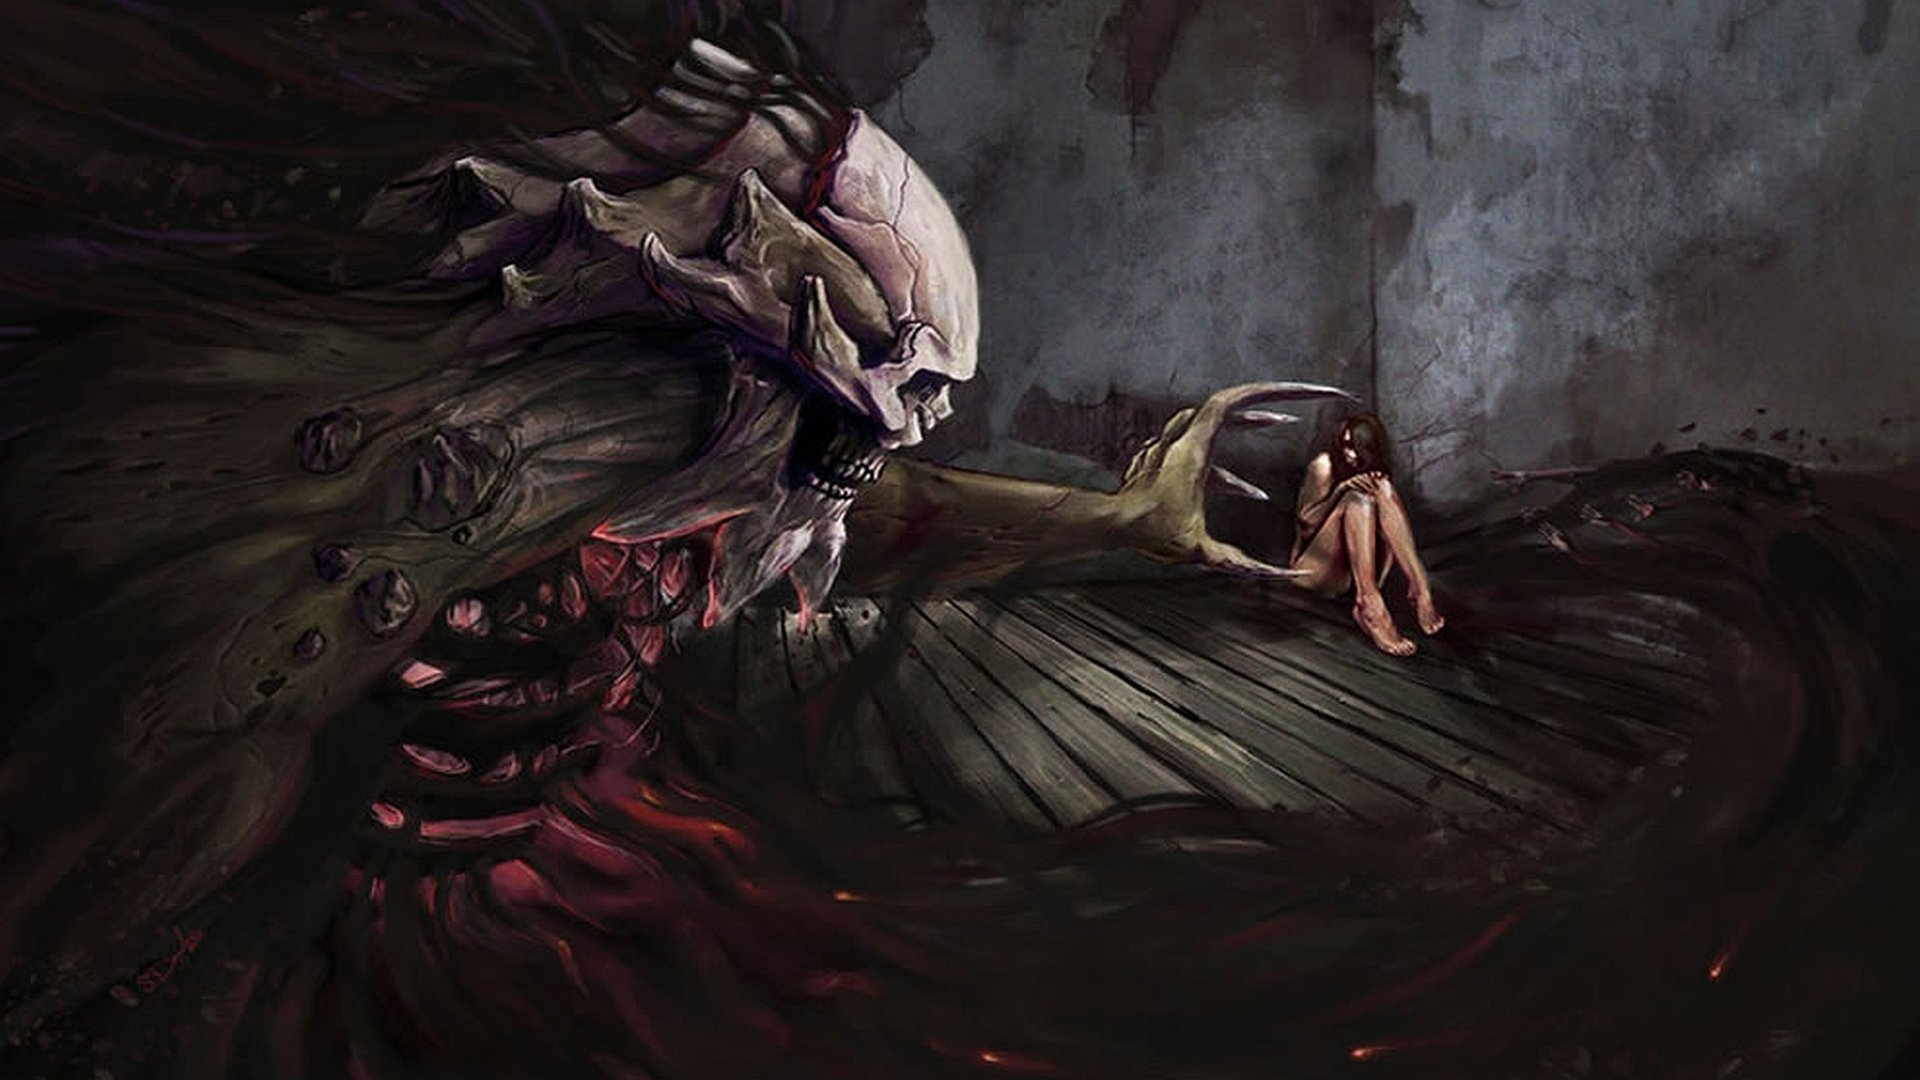 Dark - Creature  Wallpaper